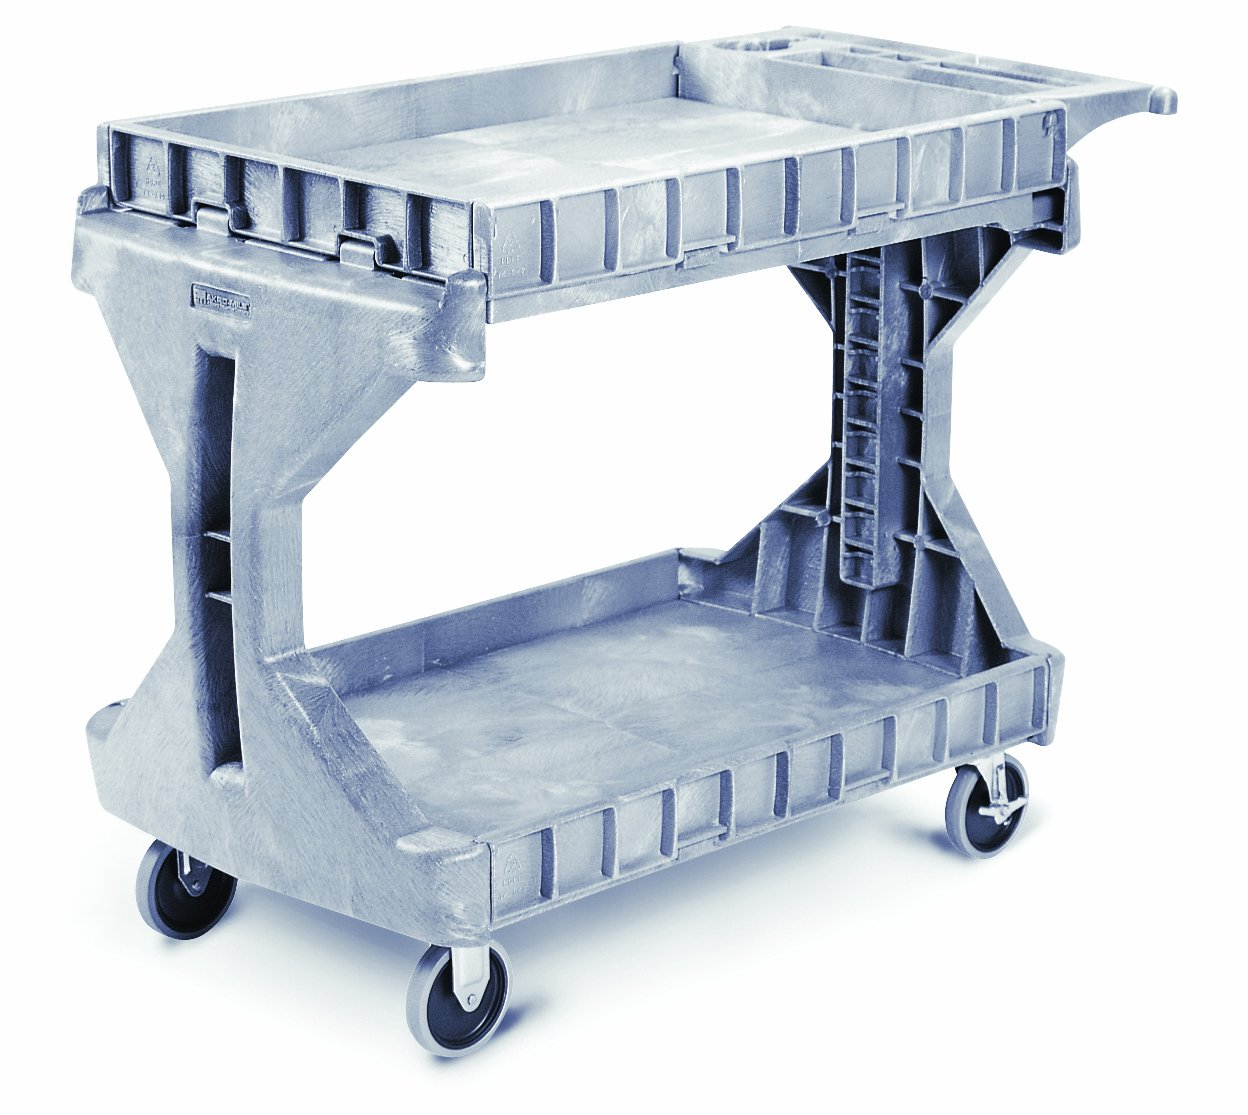 Akro-Mils 30936 2 Shelf Plastic Utility and Service ProCart, 400-Pound Capacity, Grey